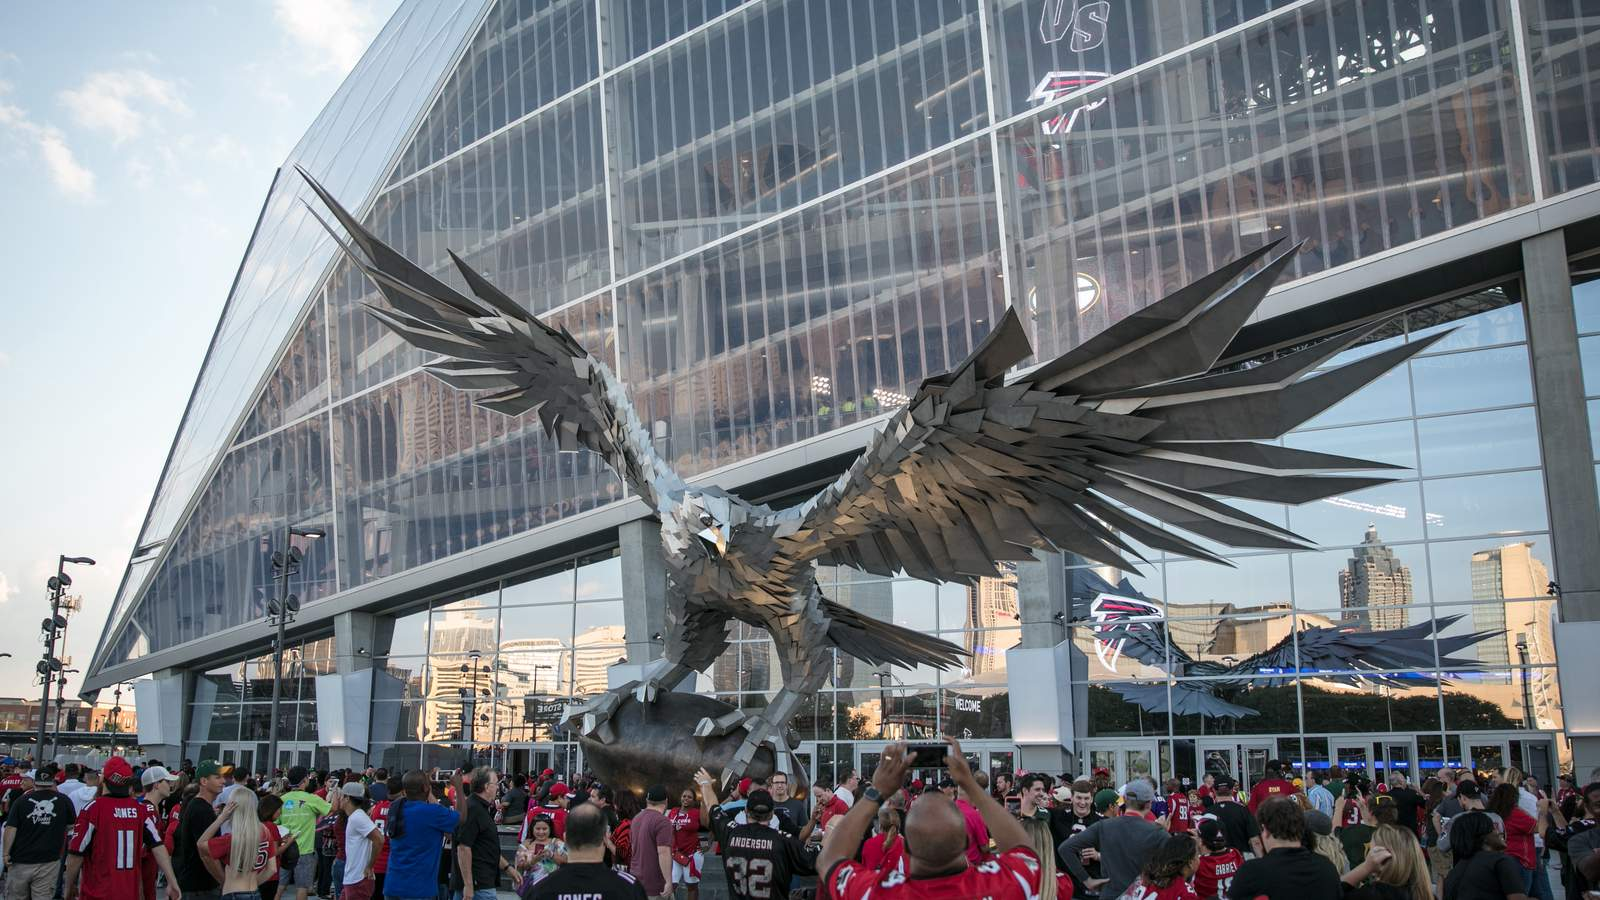 Atlanta mercedes benz stadium 71 041 page 174 for Mercedes benz stadium falcon statue